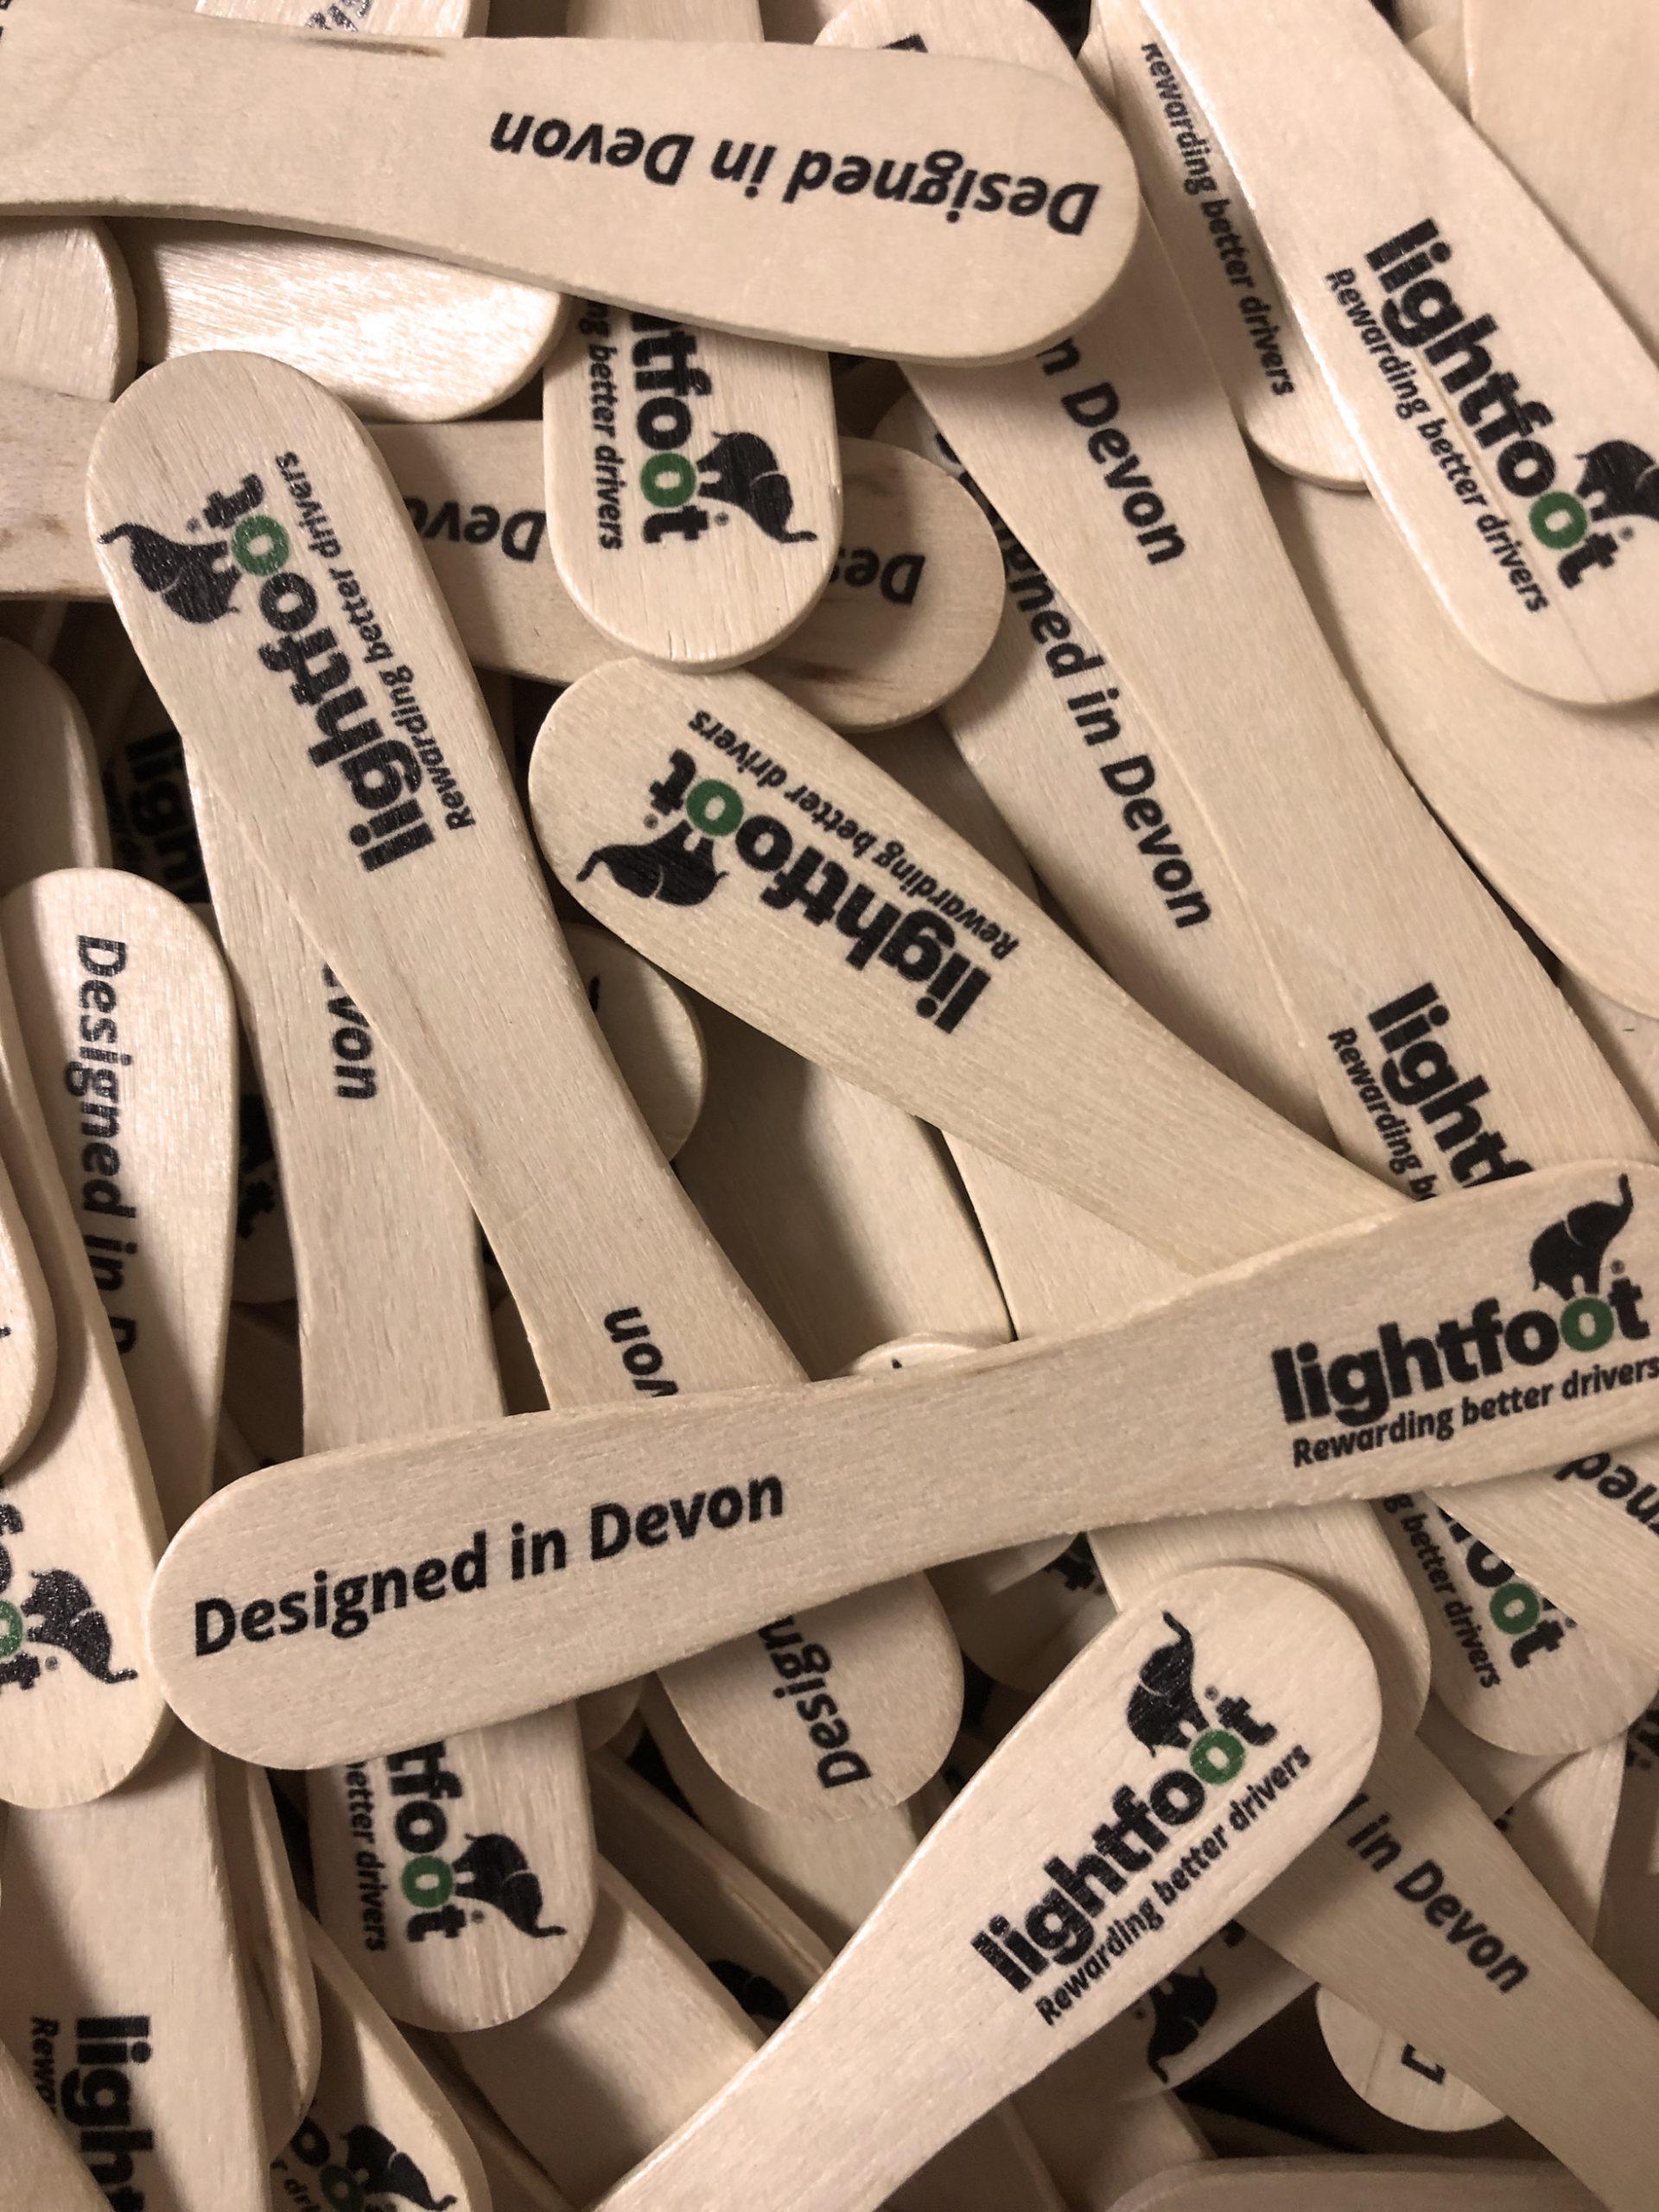 Lightfoot printed lollypop sticks